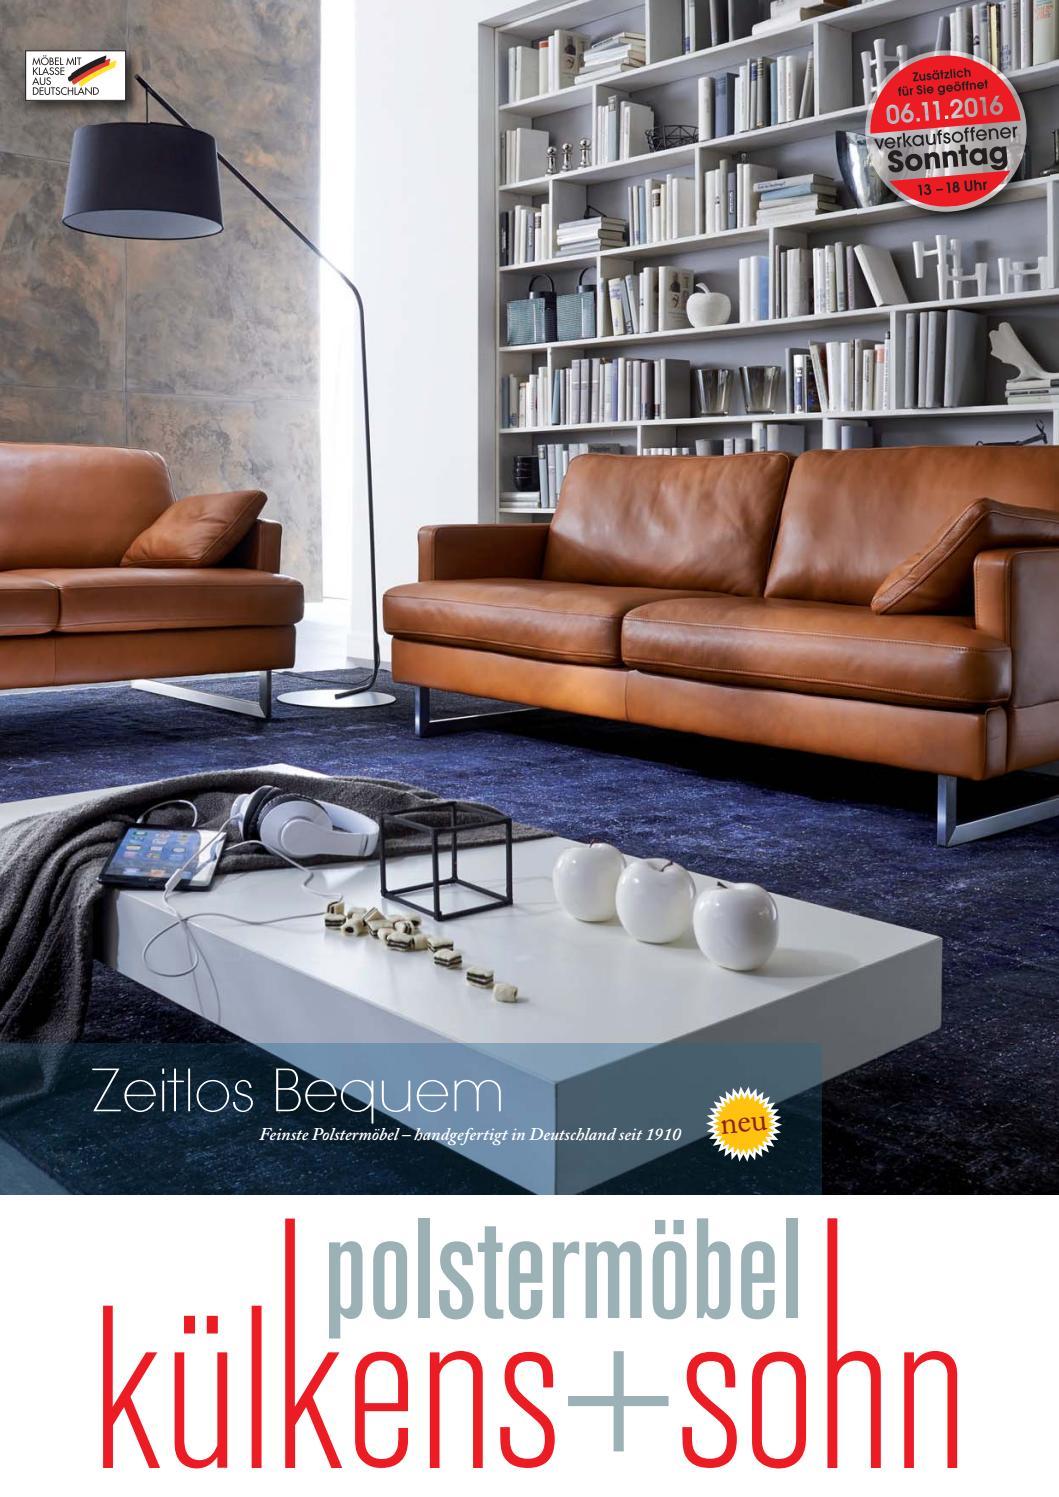 Kuelkens Hochwertpolster Prospekt 1016 by Perspektive Werbeagentur ...